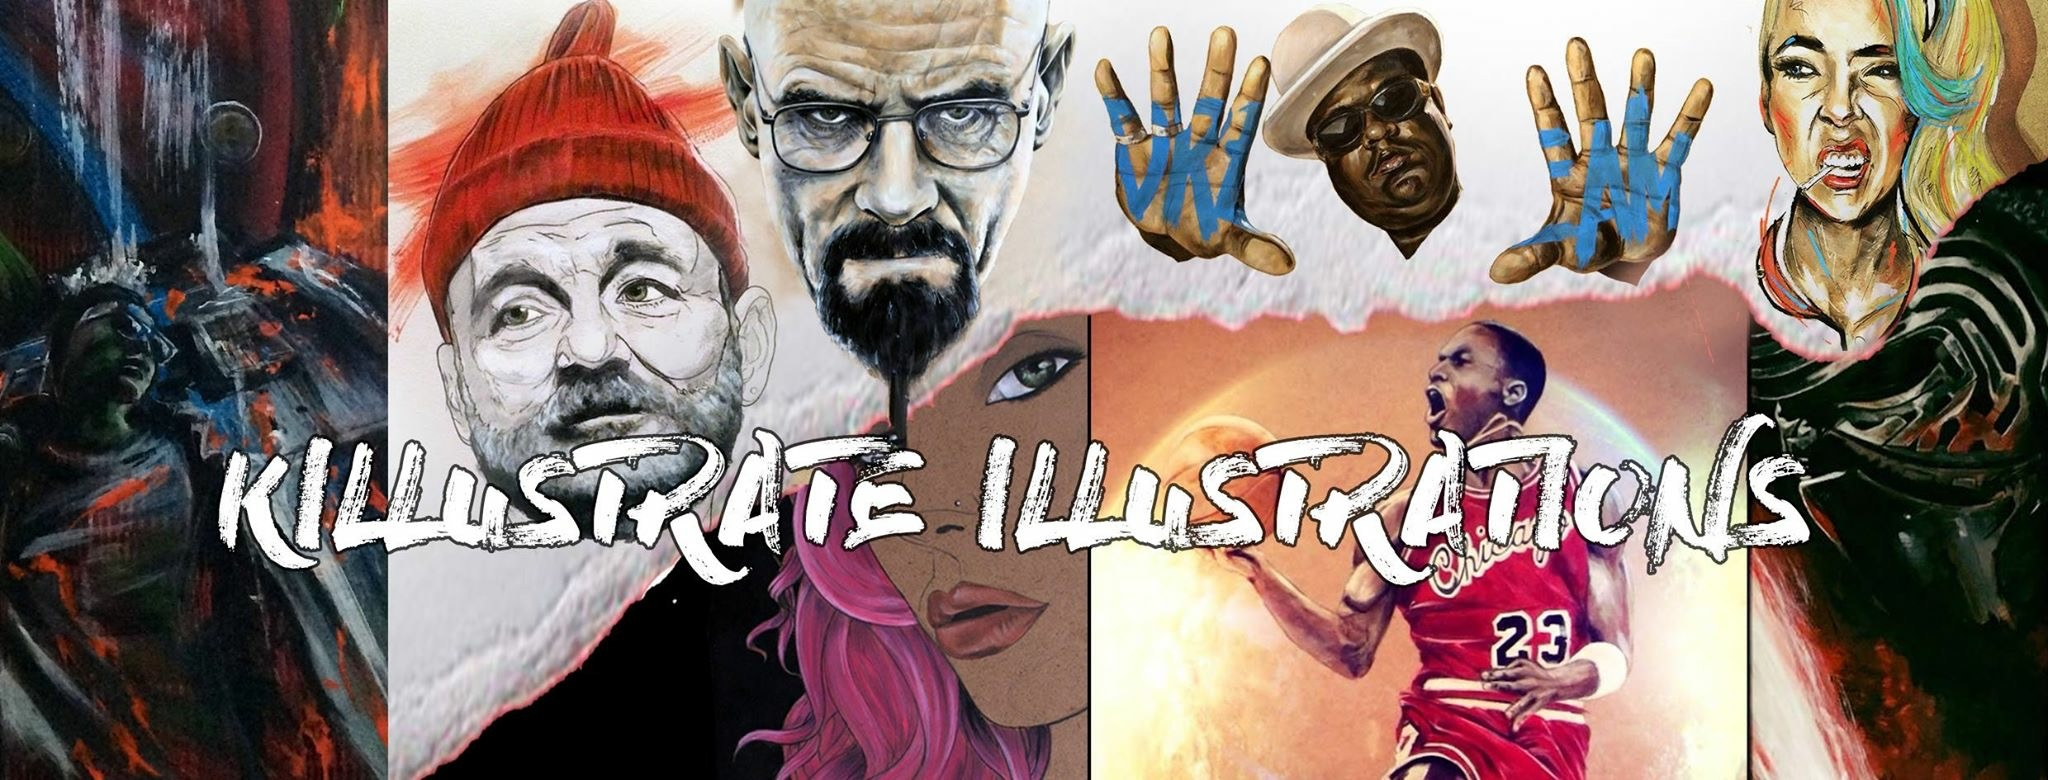 Killustrate illustrations (@killustrate) Cover Image